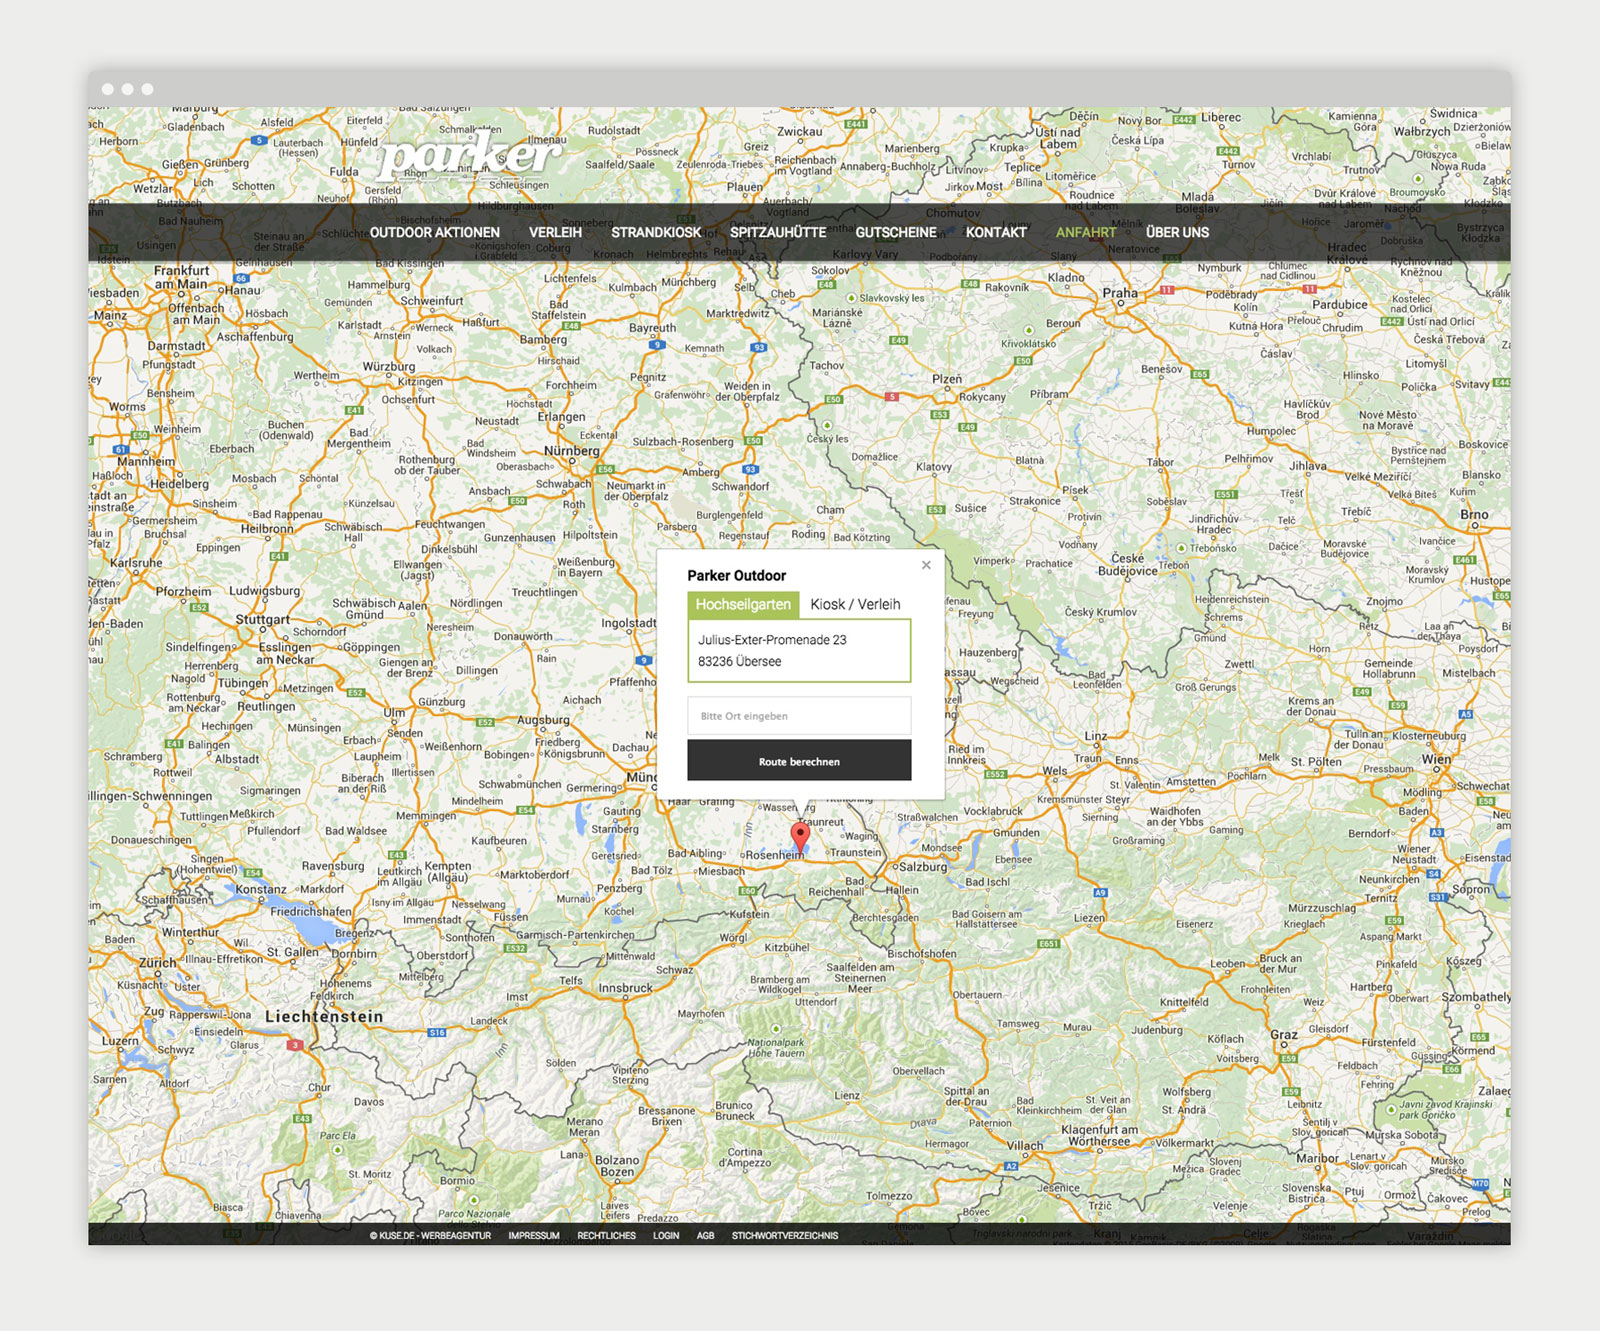 Parker Outdoor Website - Mockup Anfahrt